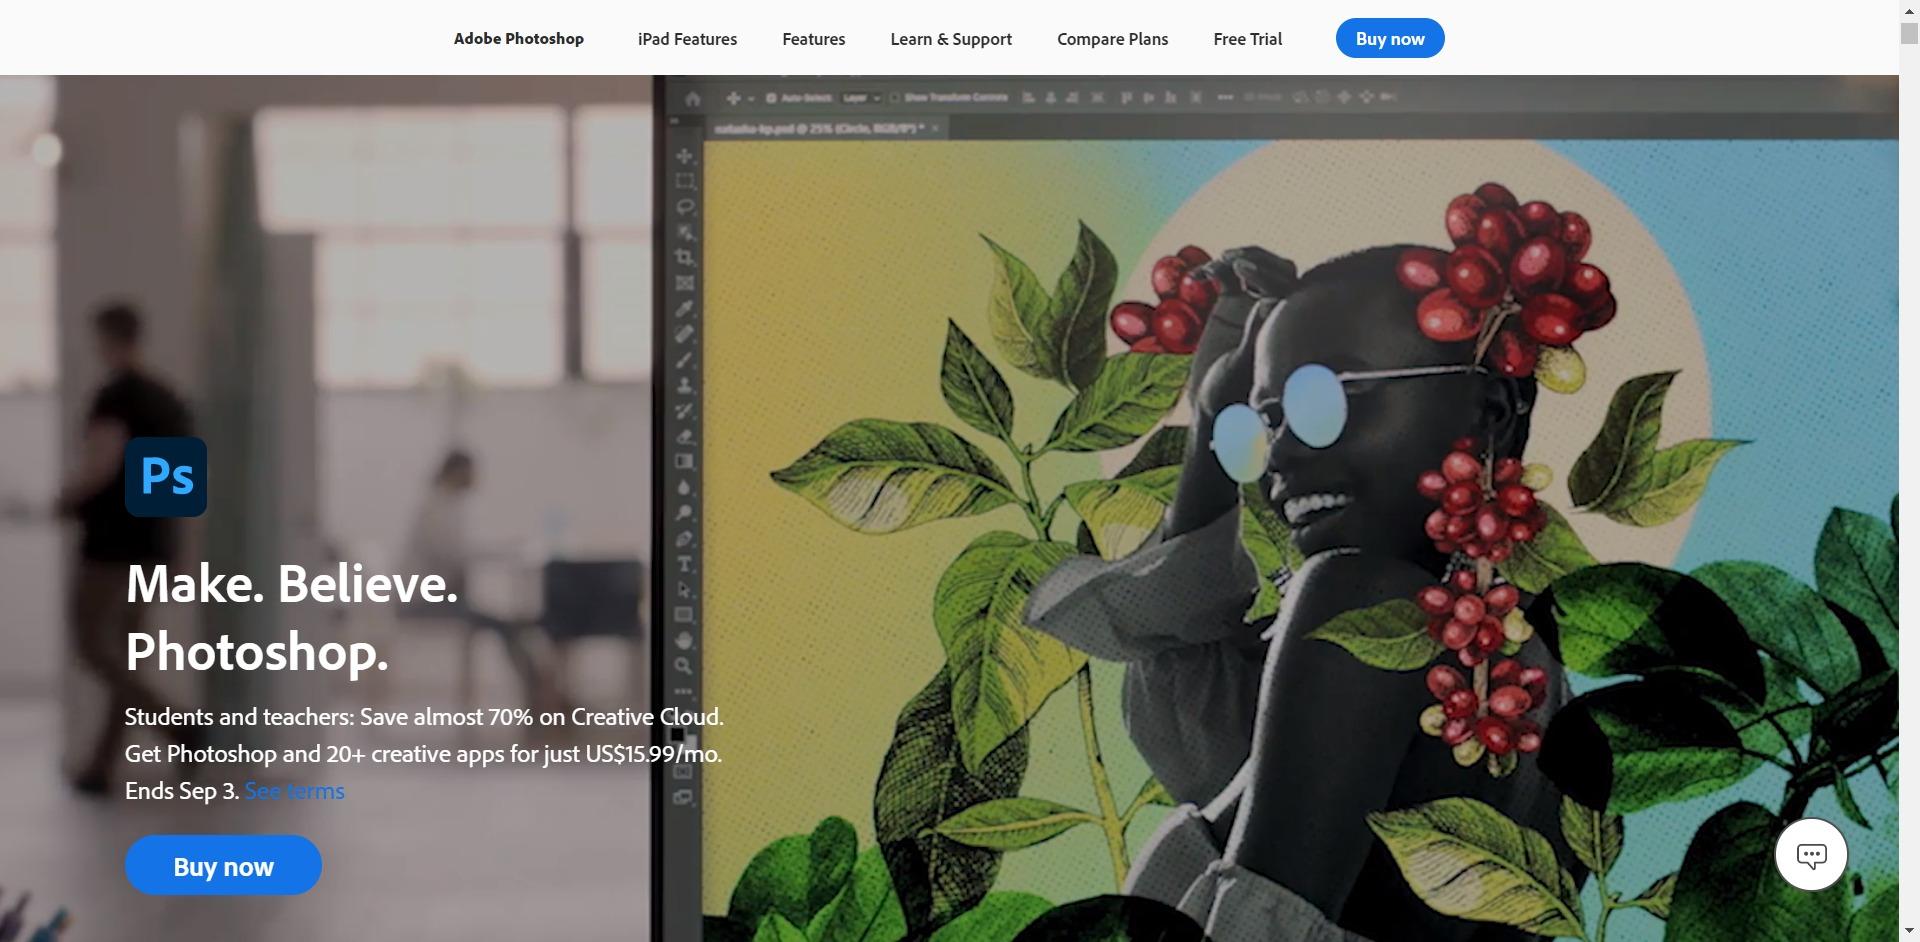 Adobe Photoshop home page